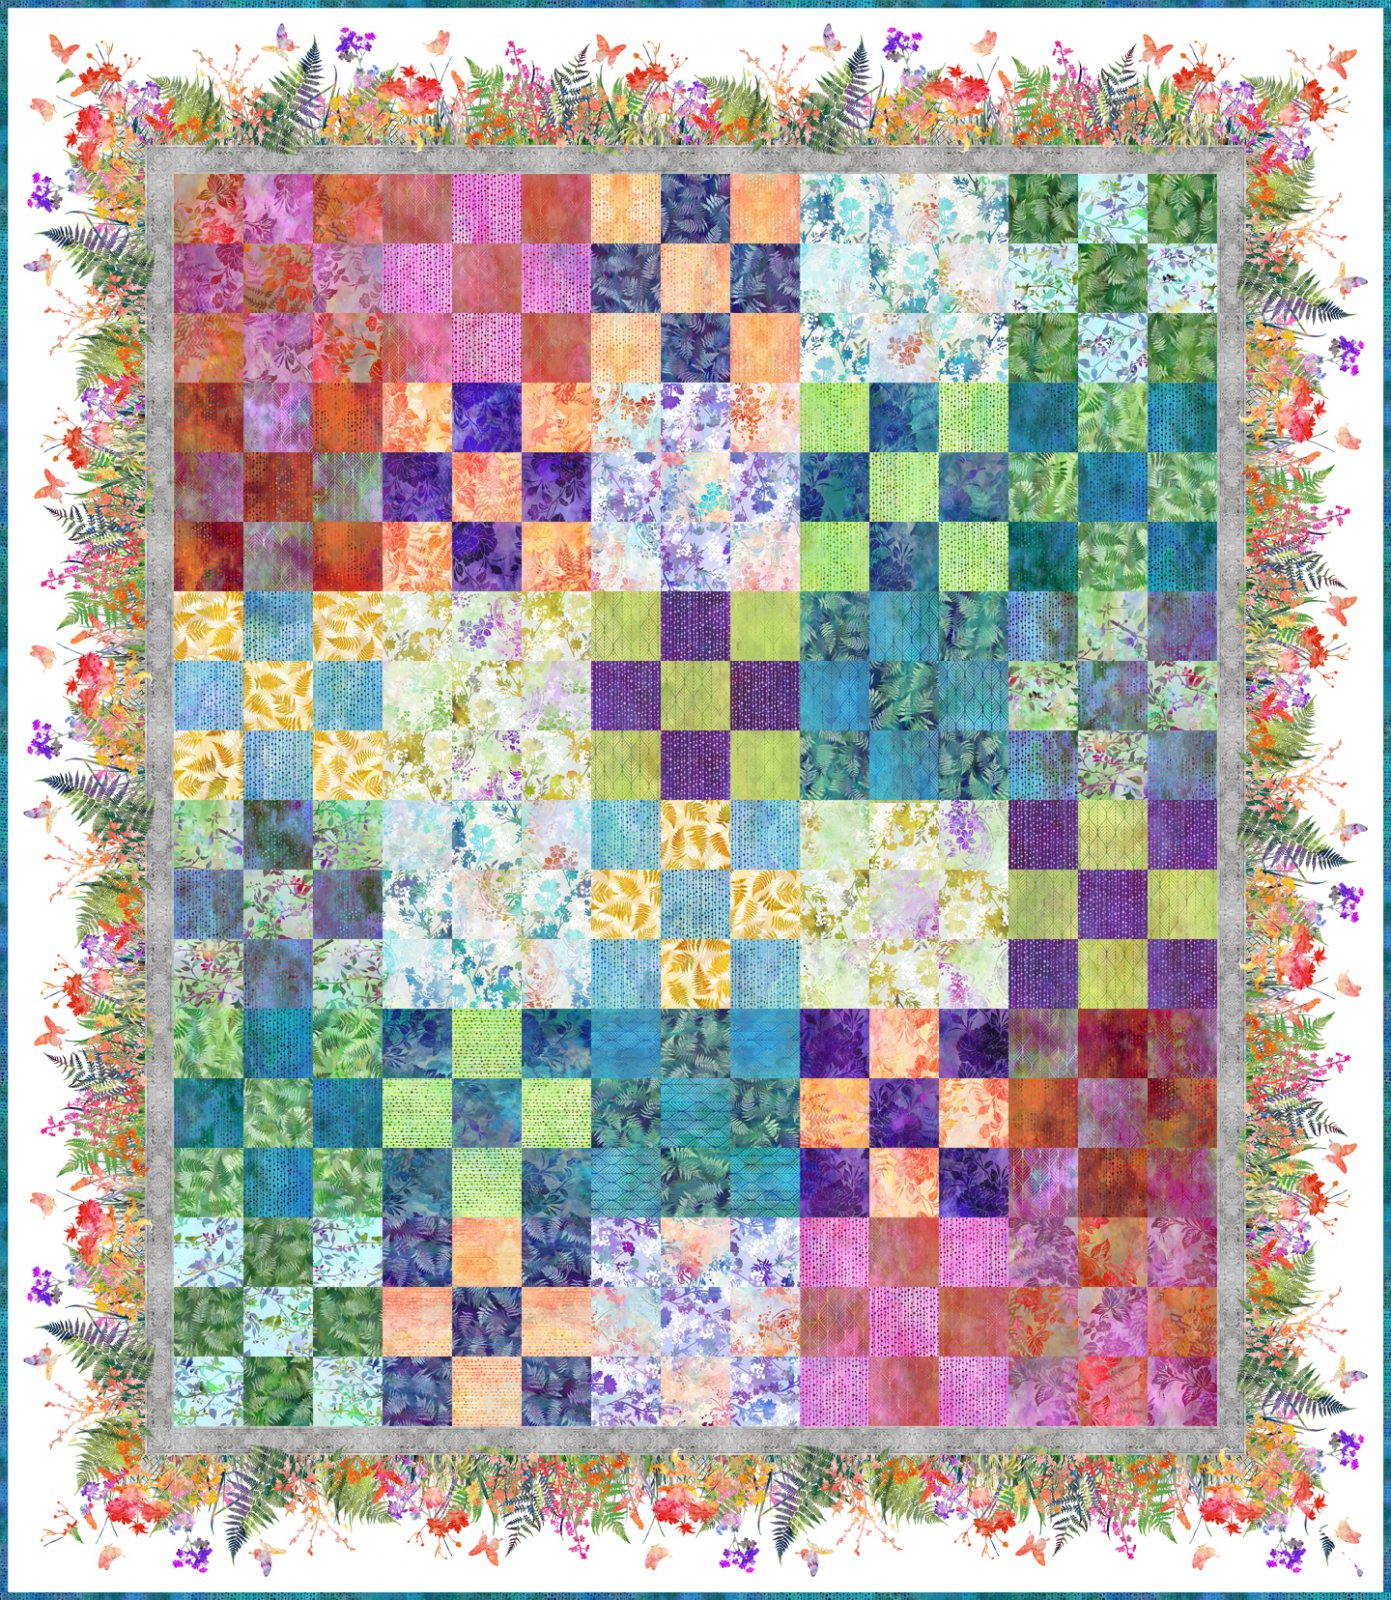 Garden 9-Patch Quilt